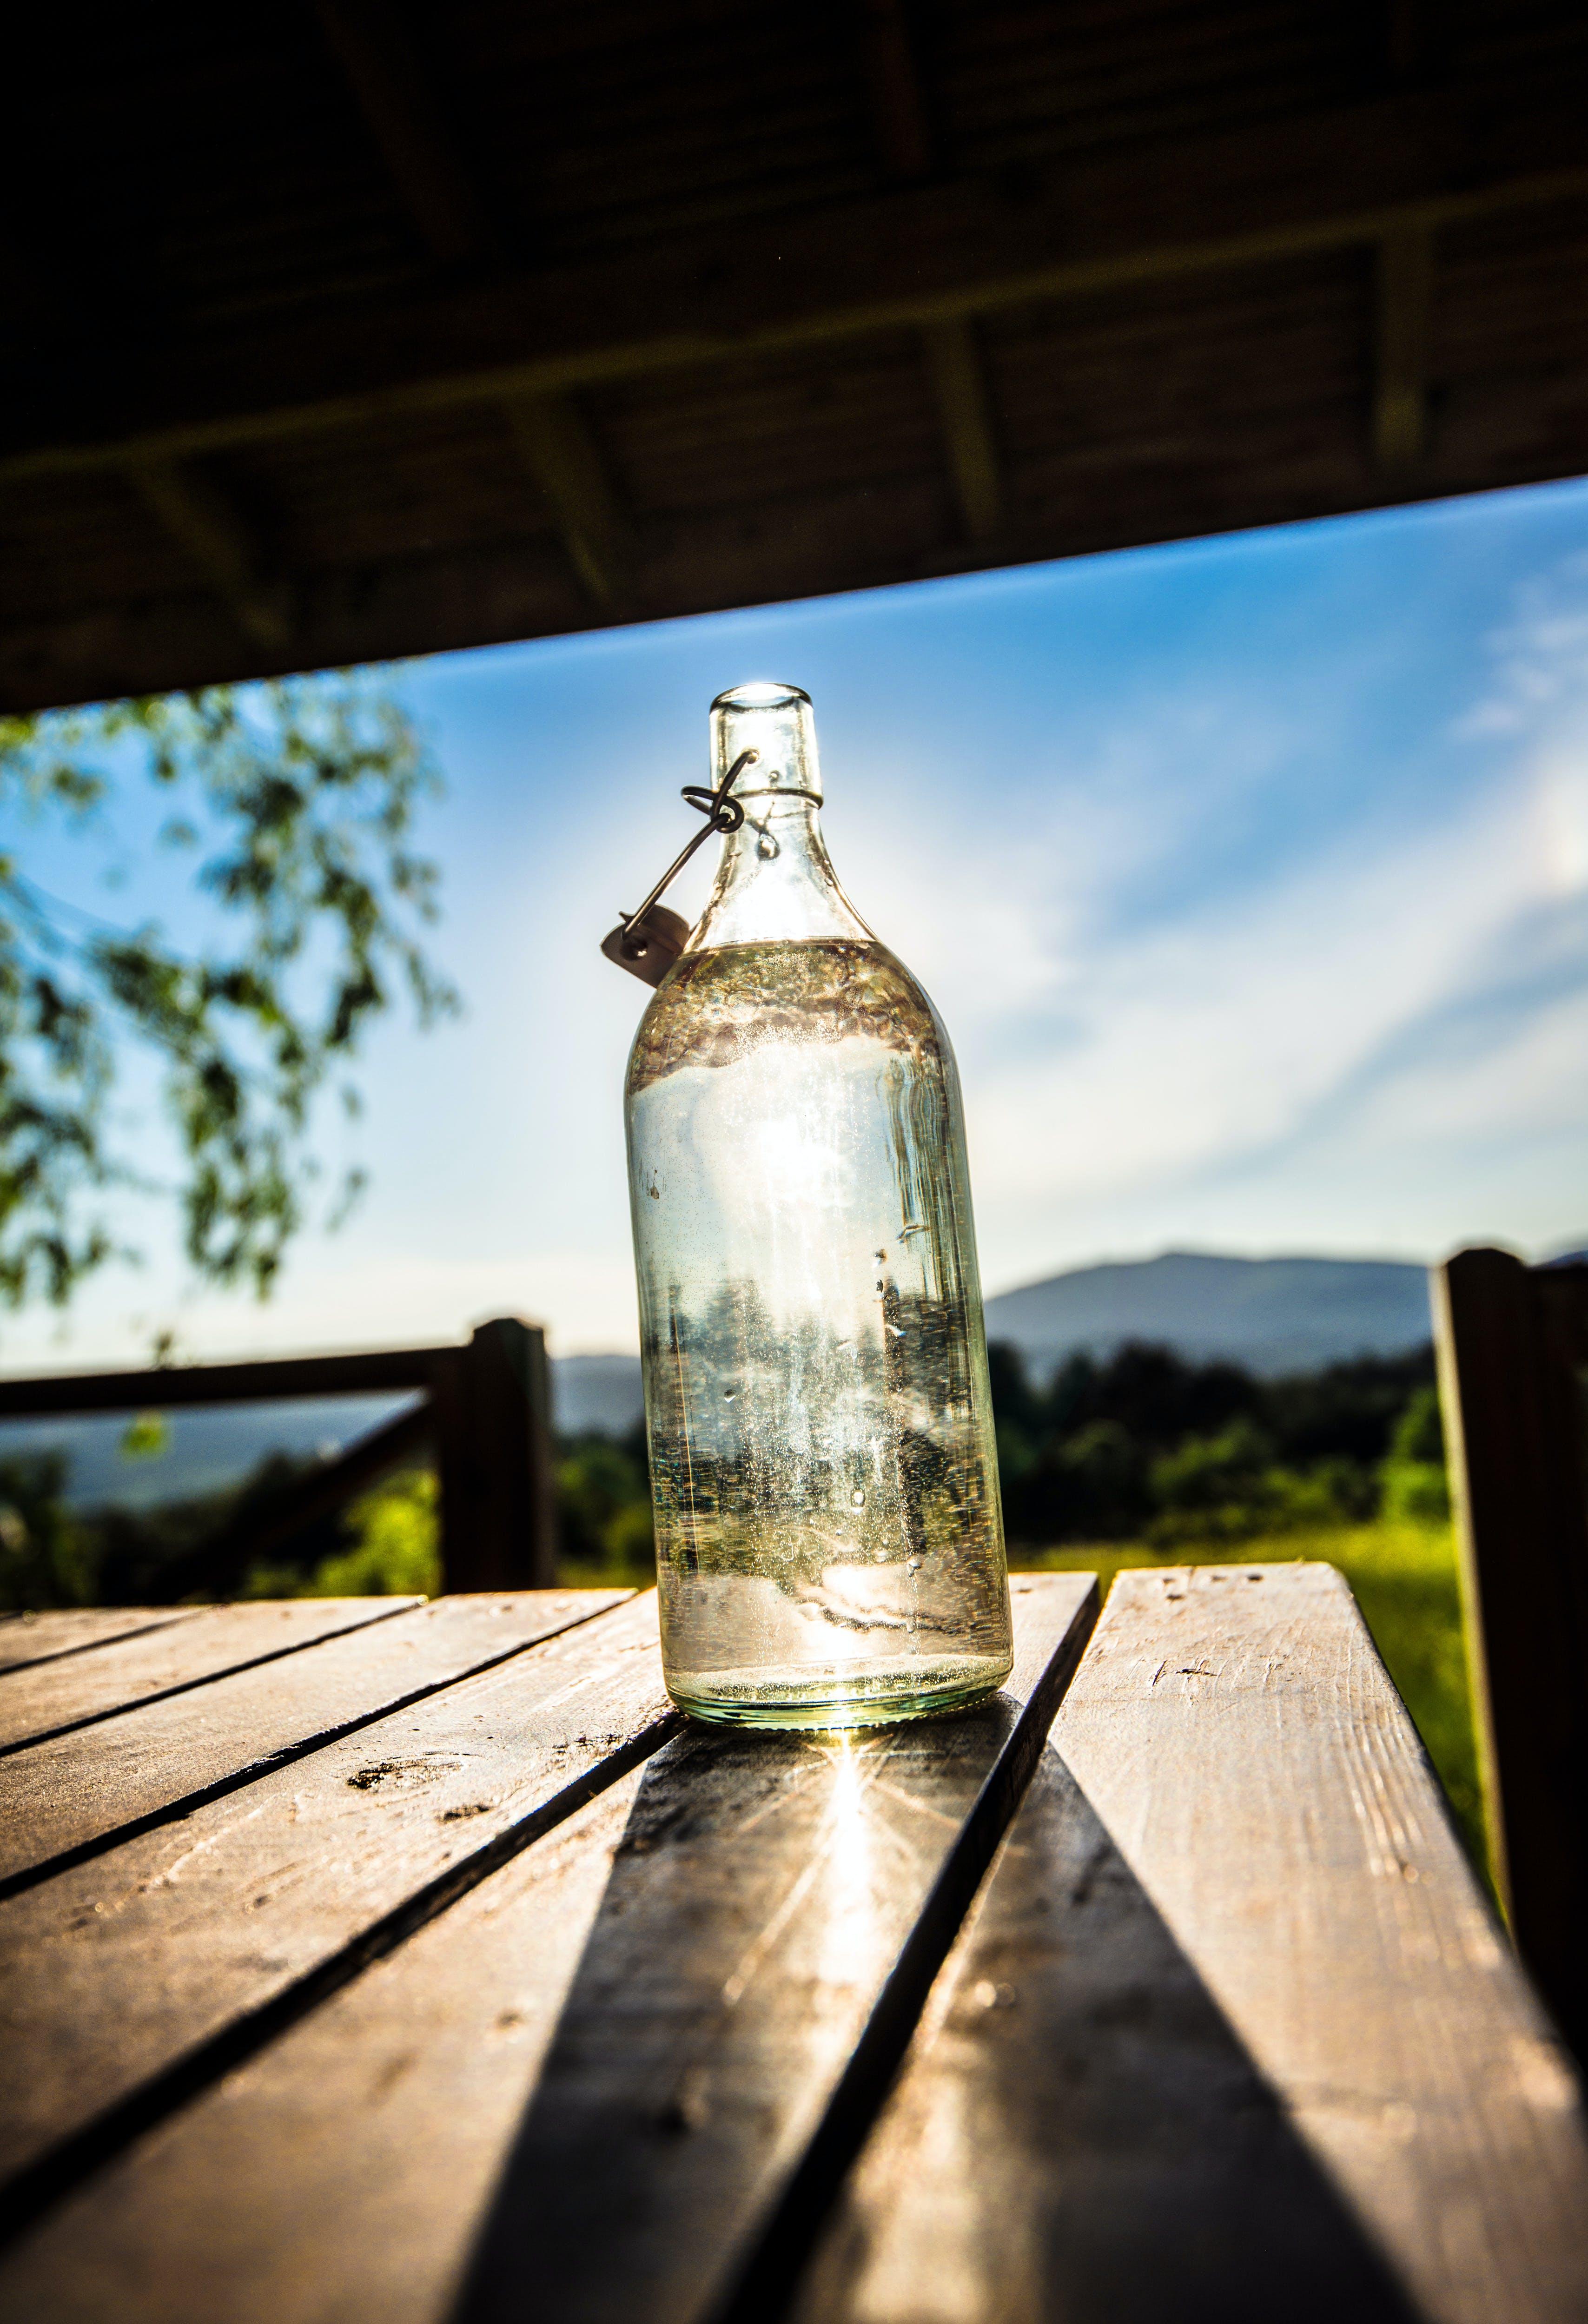 Free stock photo of bottle, decoration, garden, glass